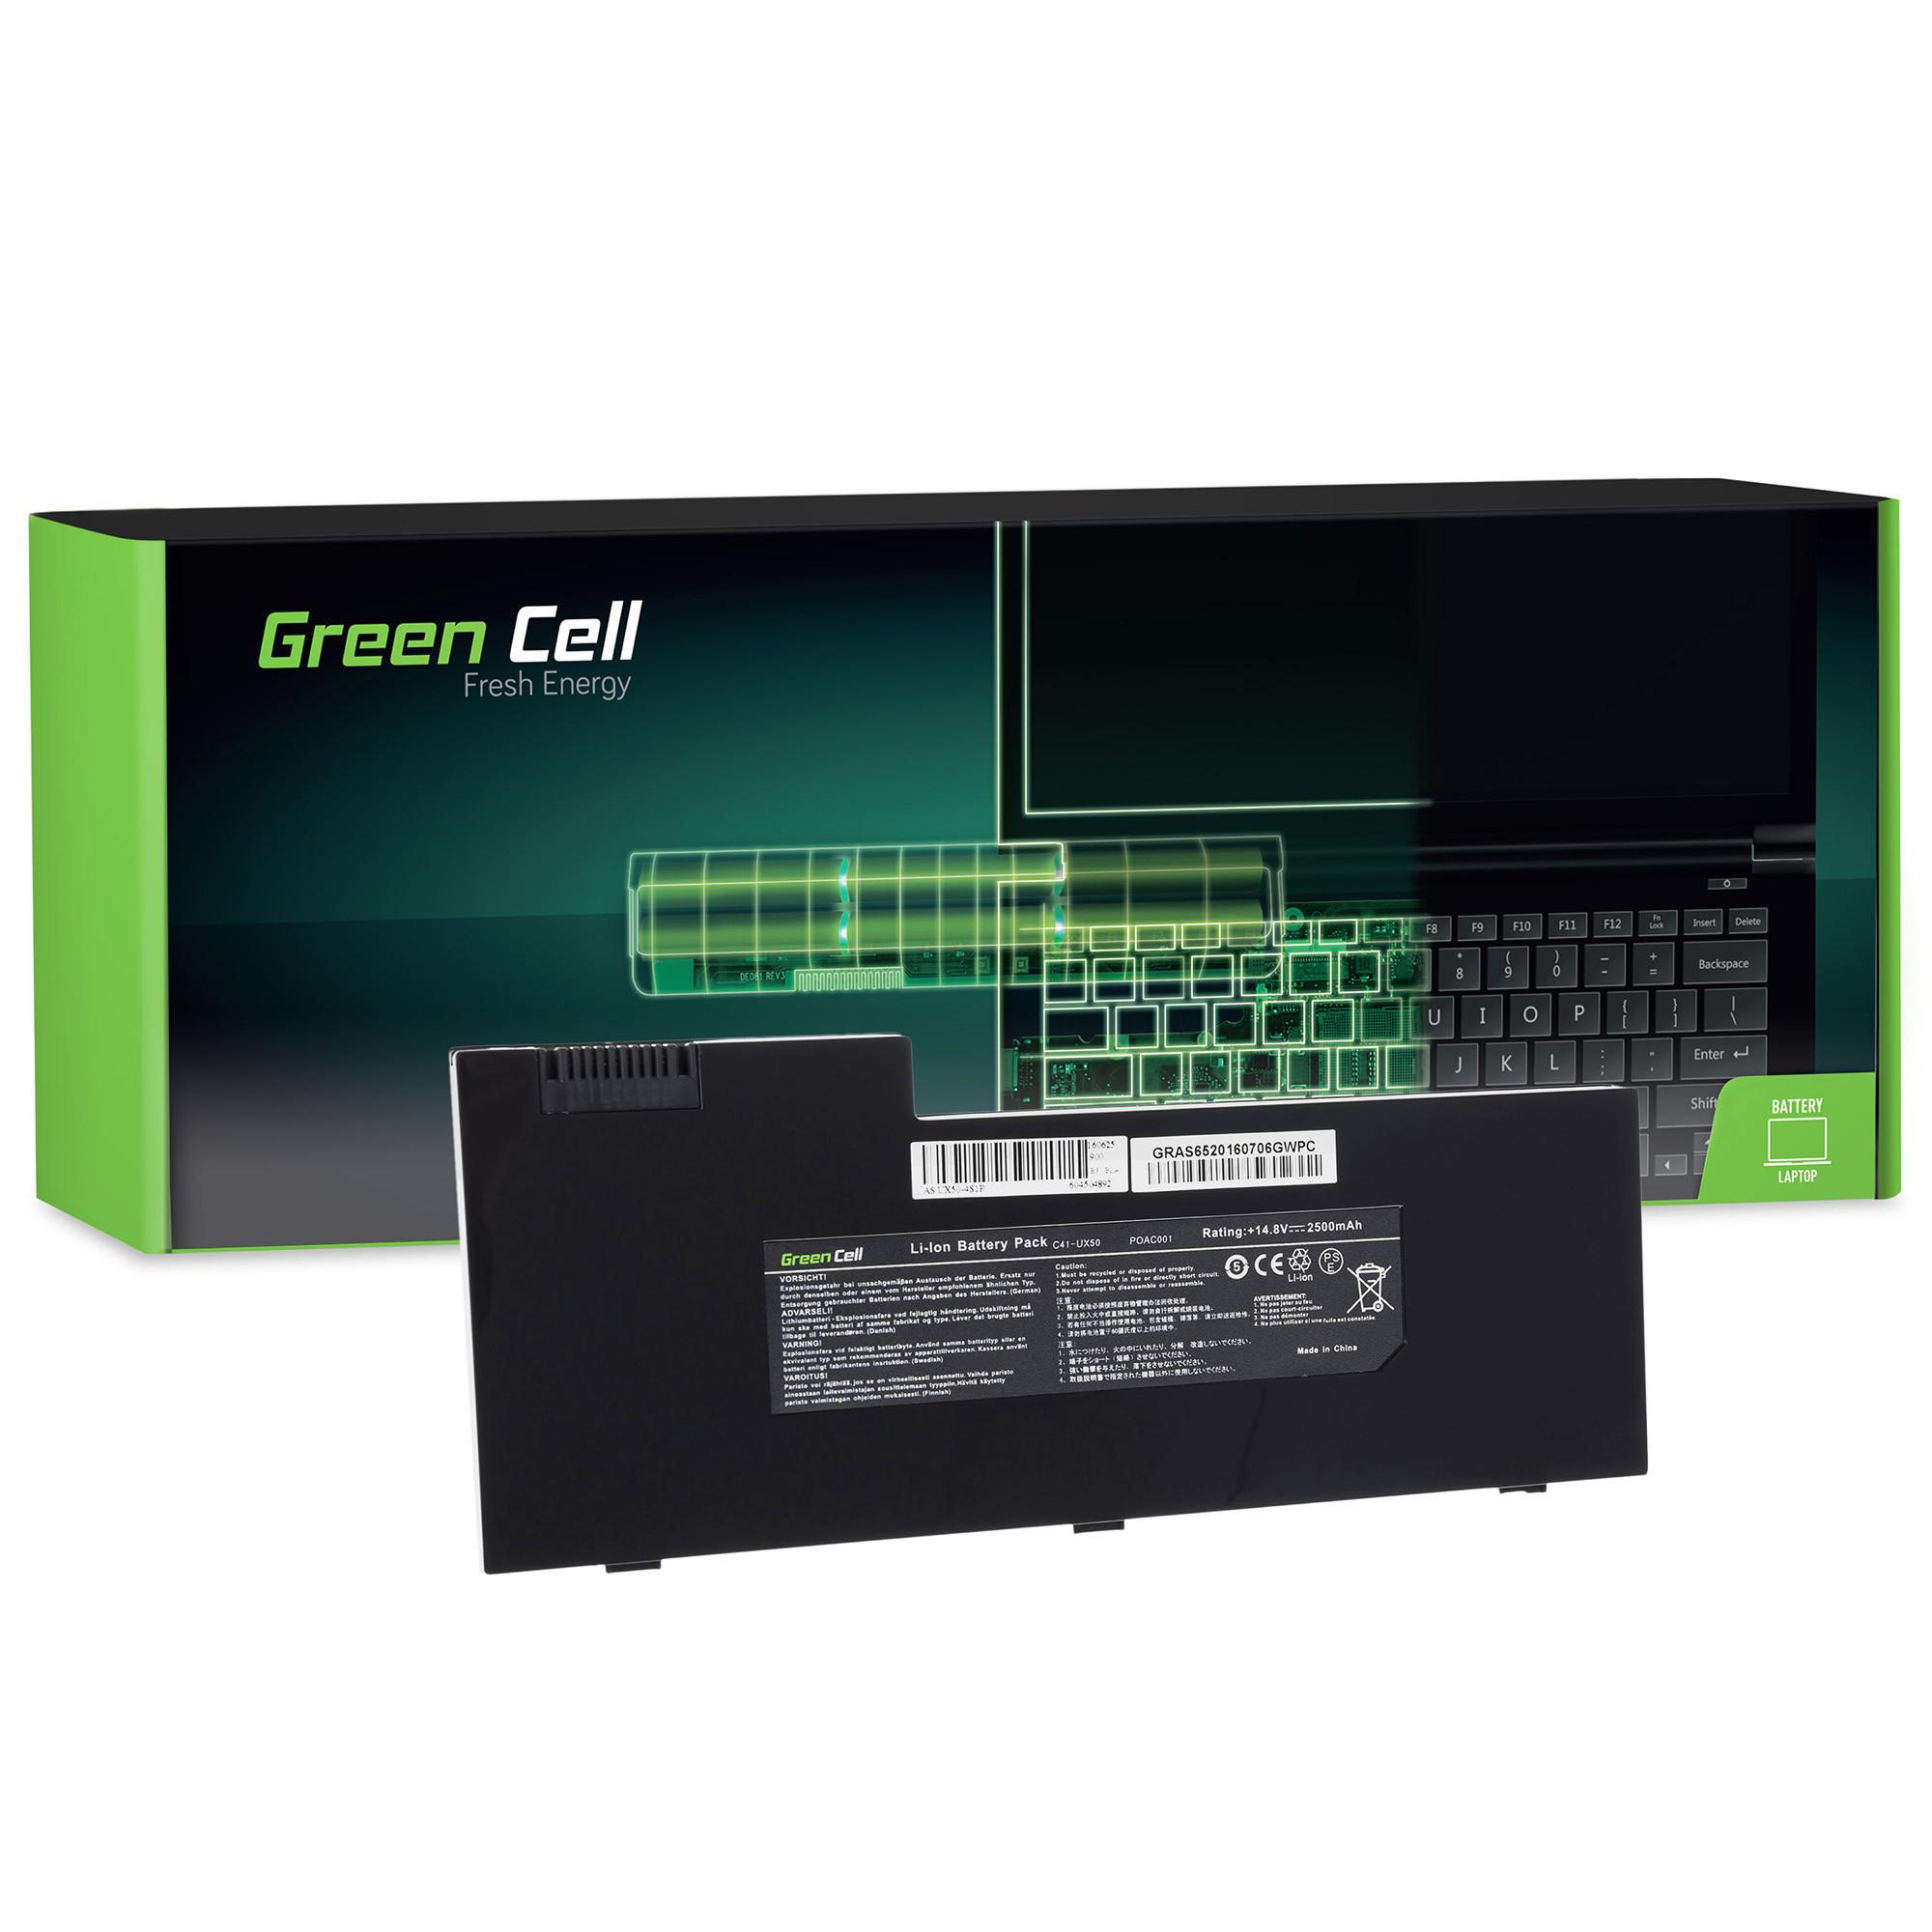 Green Cell AS65 Baterie Asus UX50/UX50V/C41-UX50 2600mAh Li-ion - neoriginální